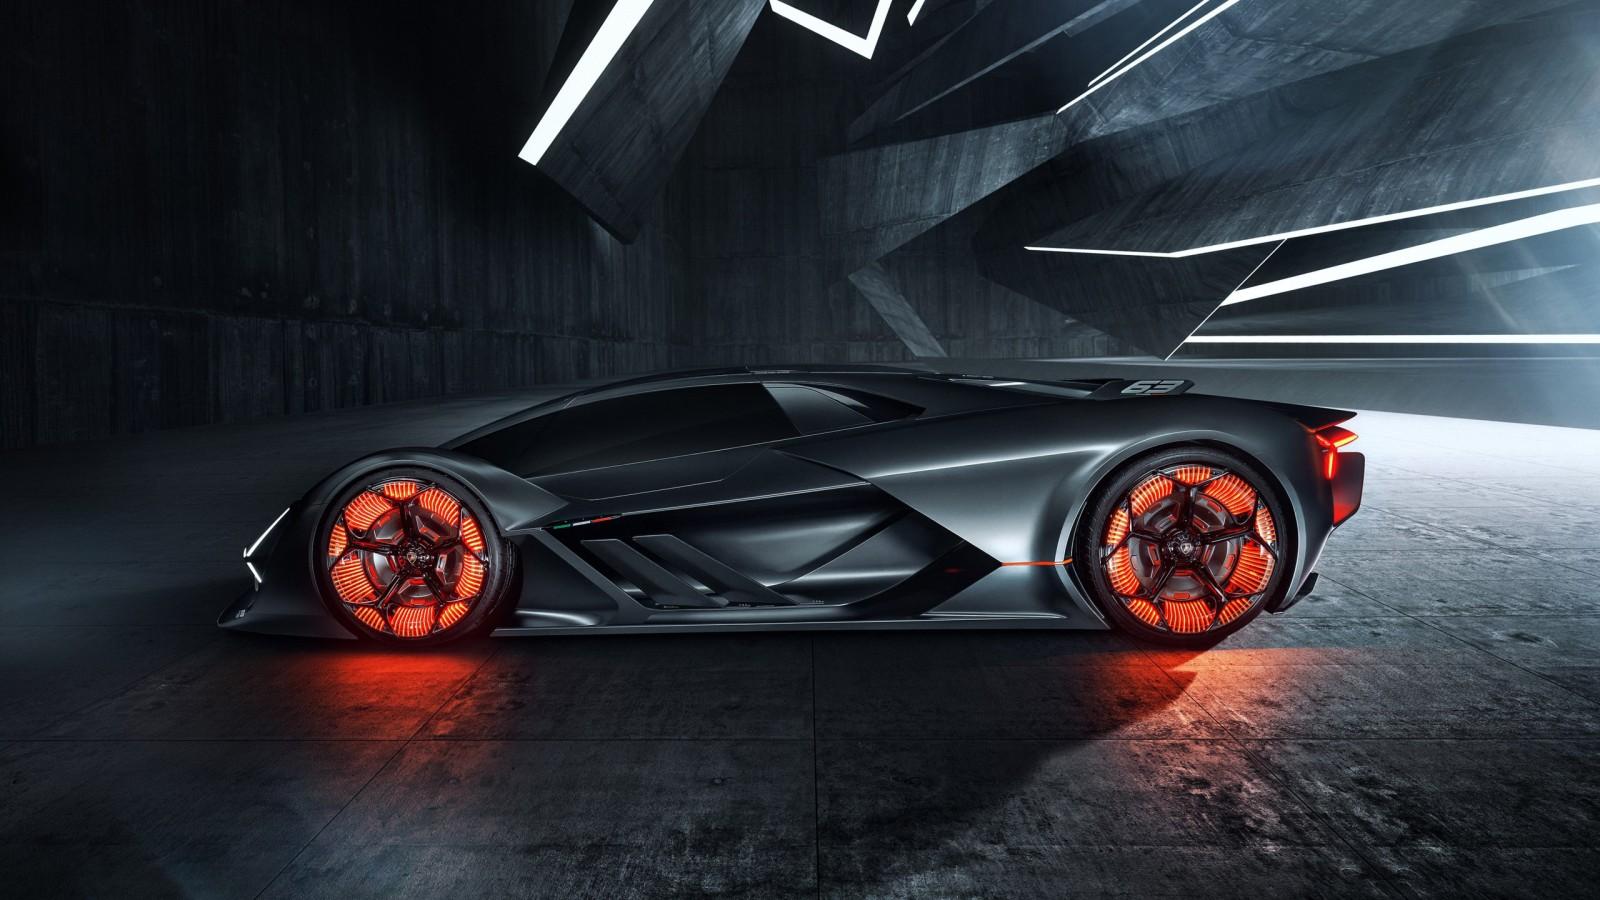 Lamborghini Cars Photos Wallpapers Lamborghini Terzo Millennio 2019 3 Wallpaper Hd Car